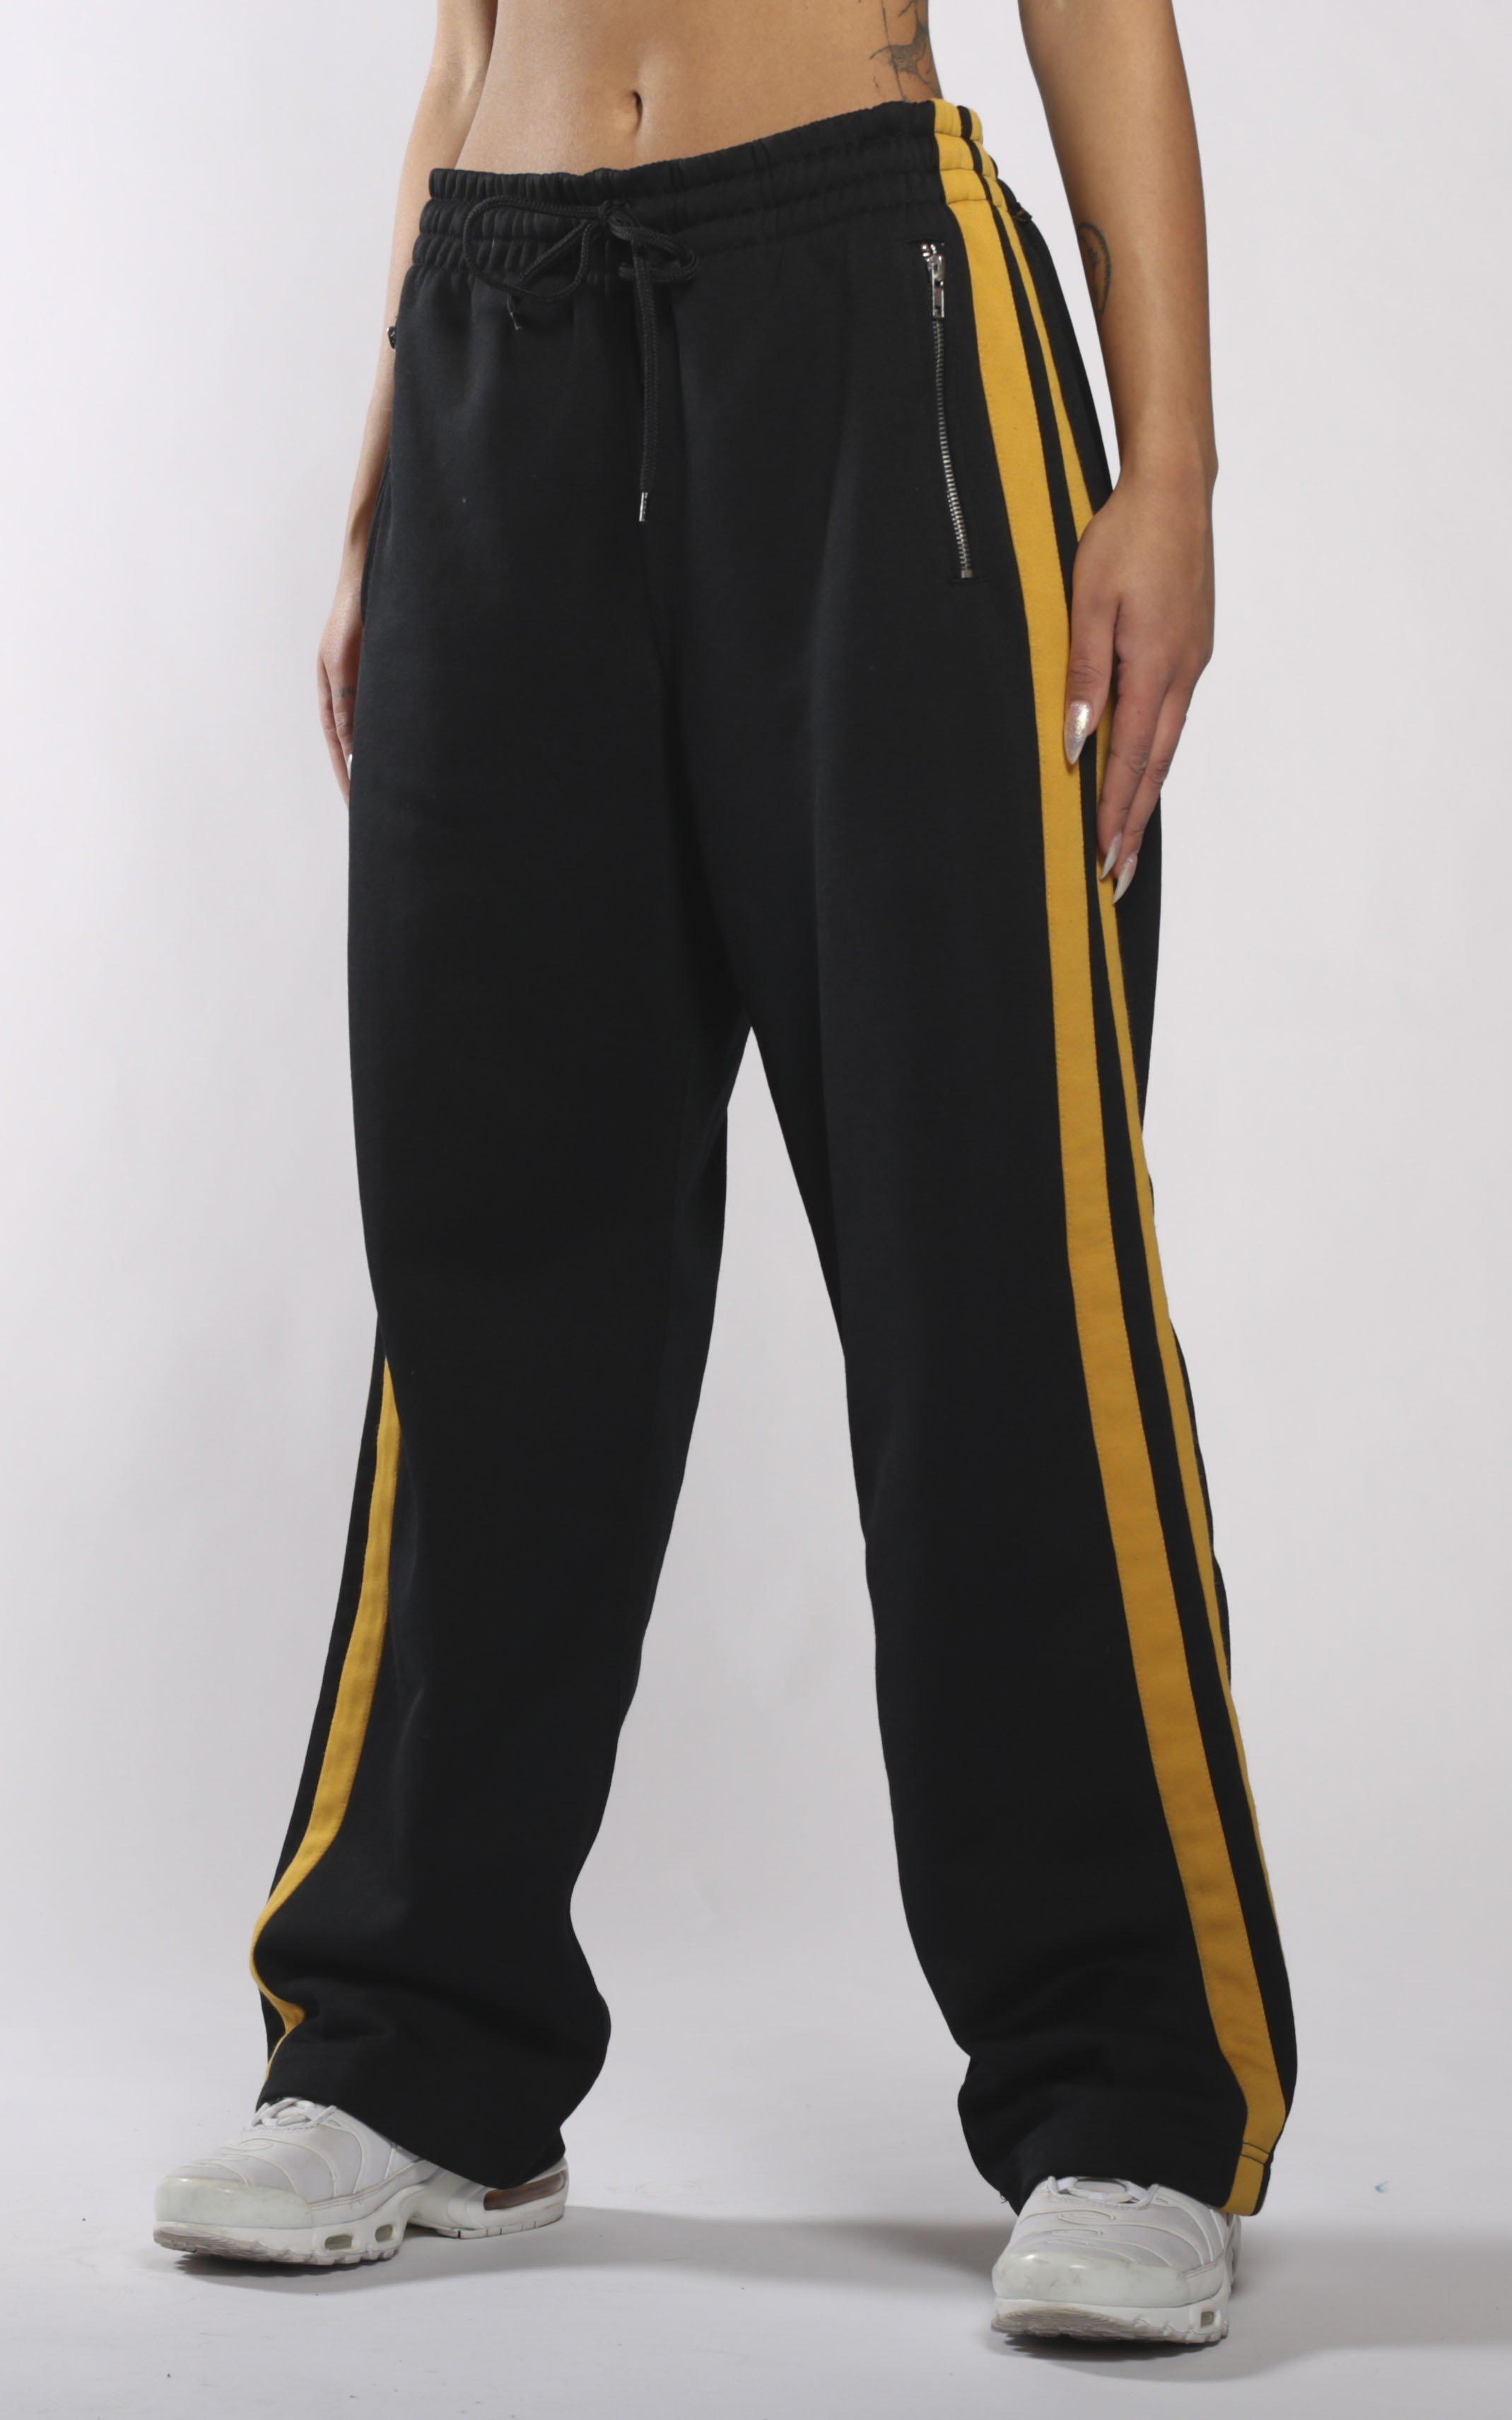 Vintage DKNY Sweatpants Frankie Collective Sweatpants